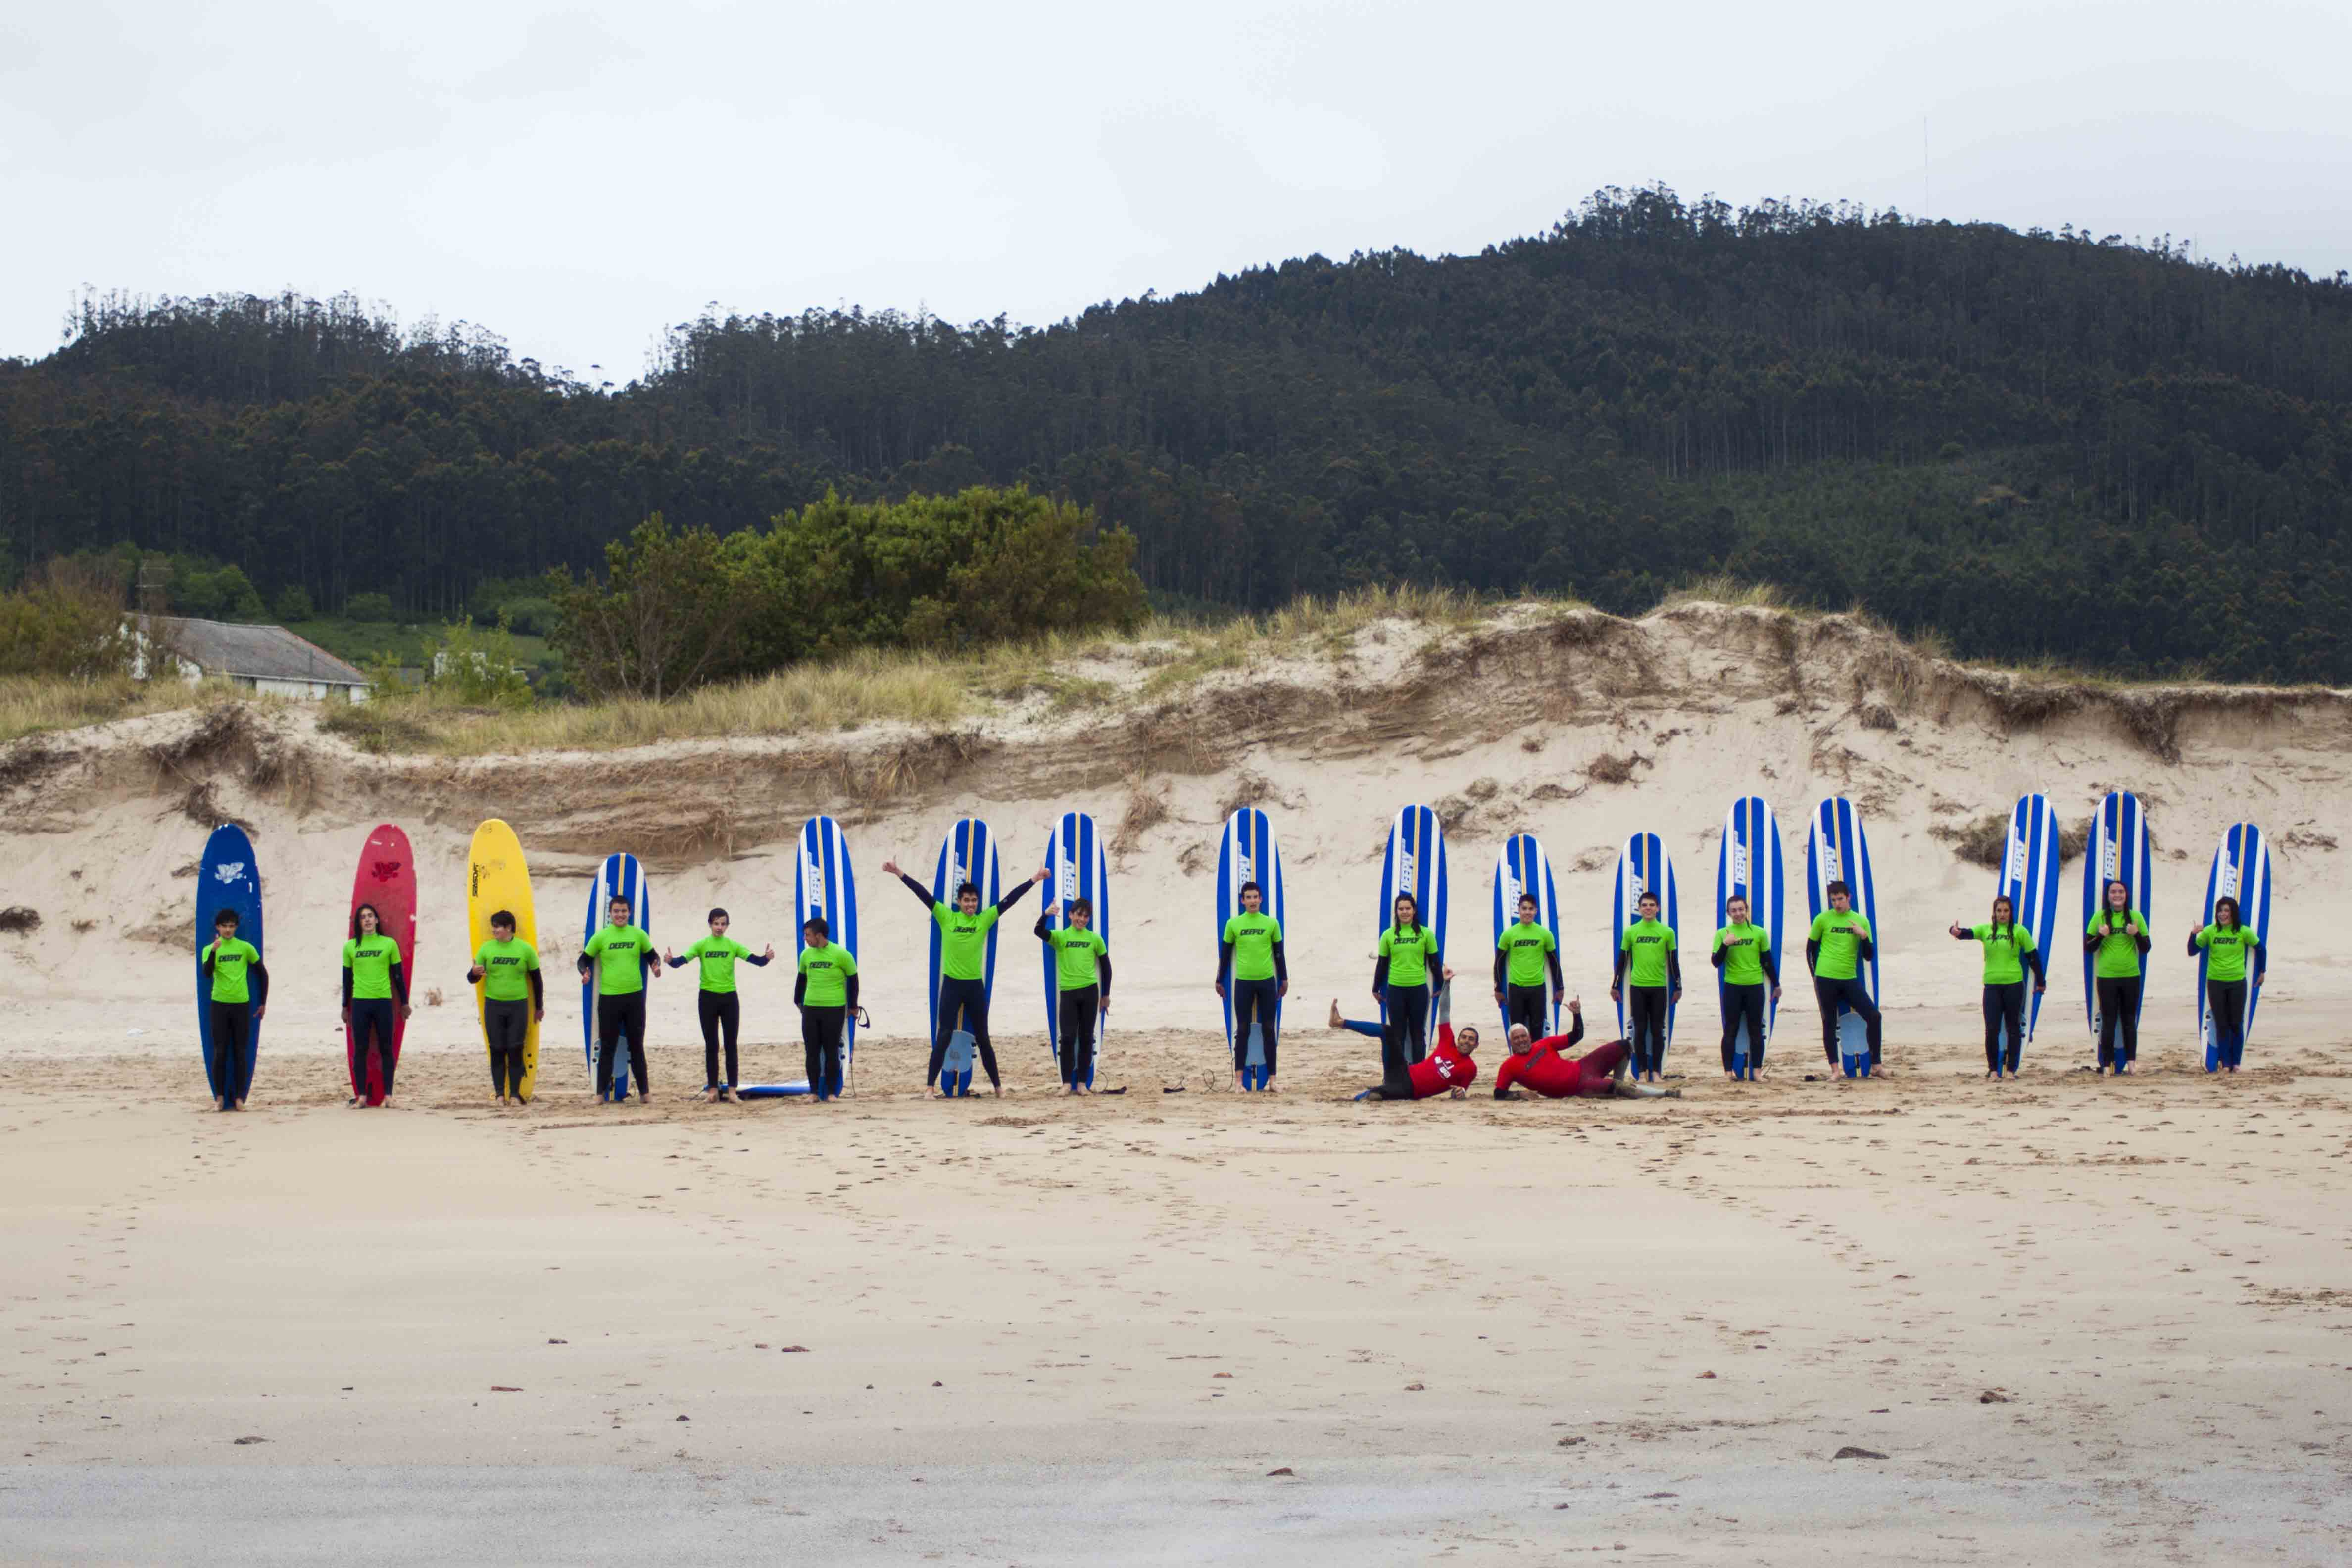 Surfcamp Alawa Surf Camp in Valdoviño, Galicia, España